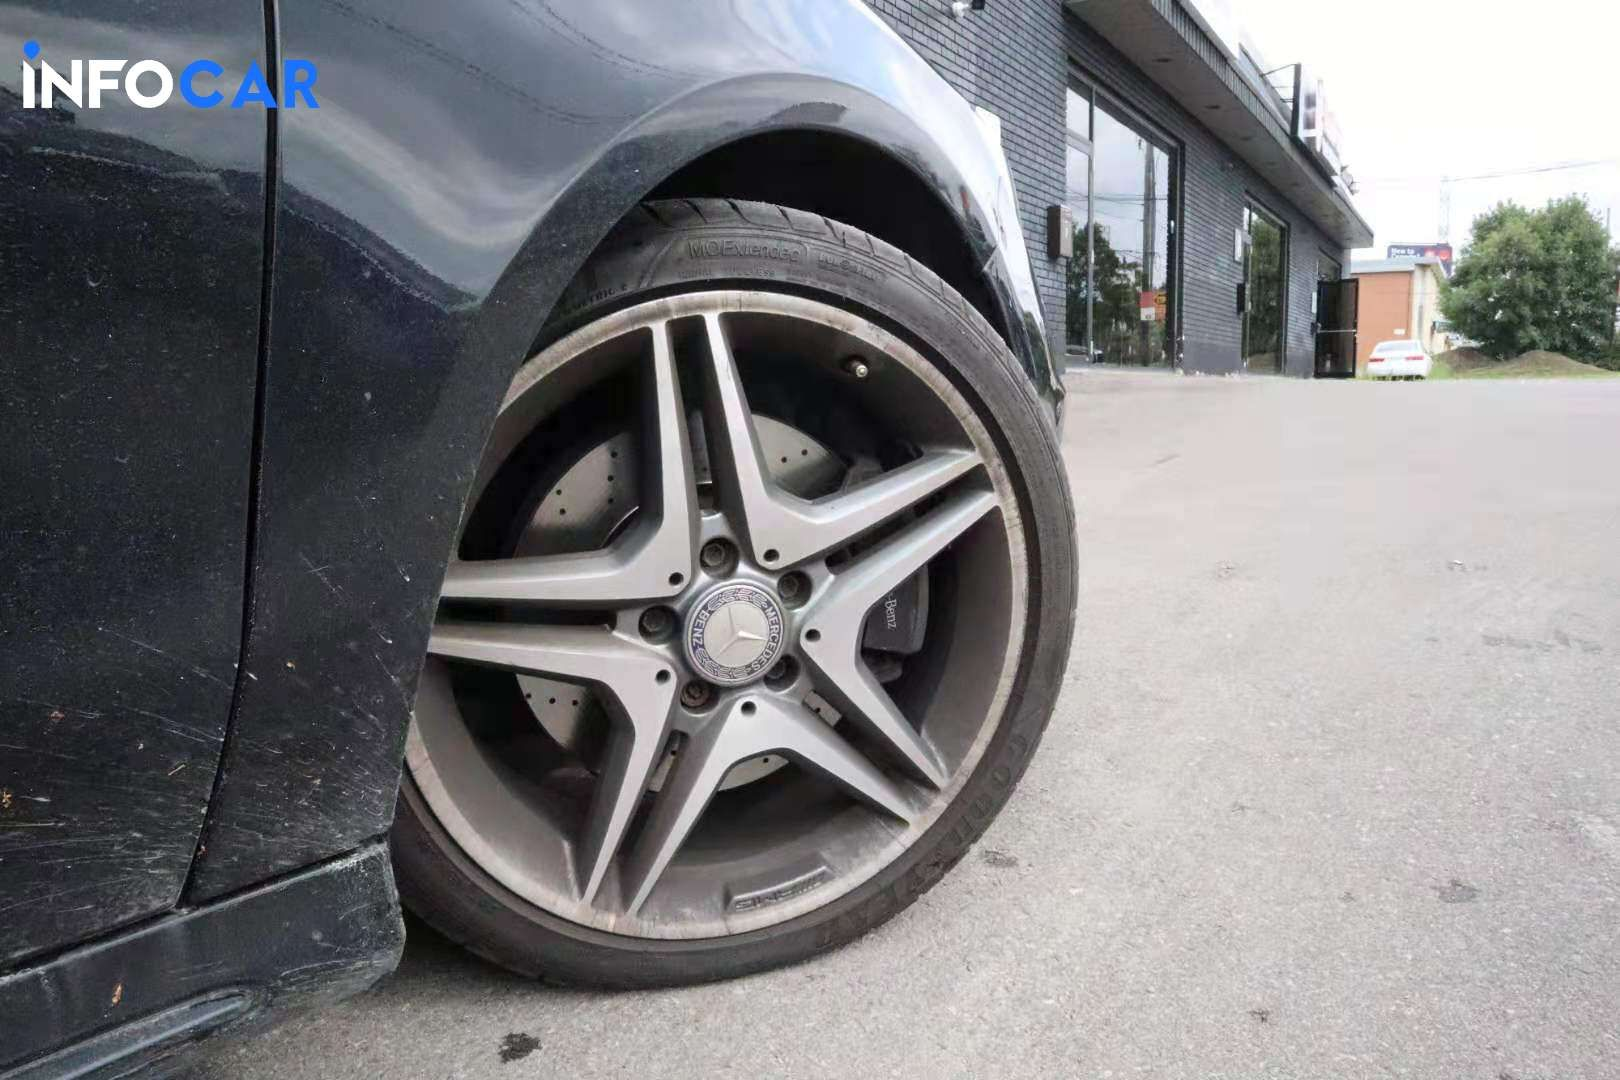 2014 Mercedes-Benz CLA-Class 250 - INFOCAR - Toronto Auto Trading Platform